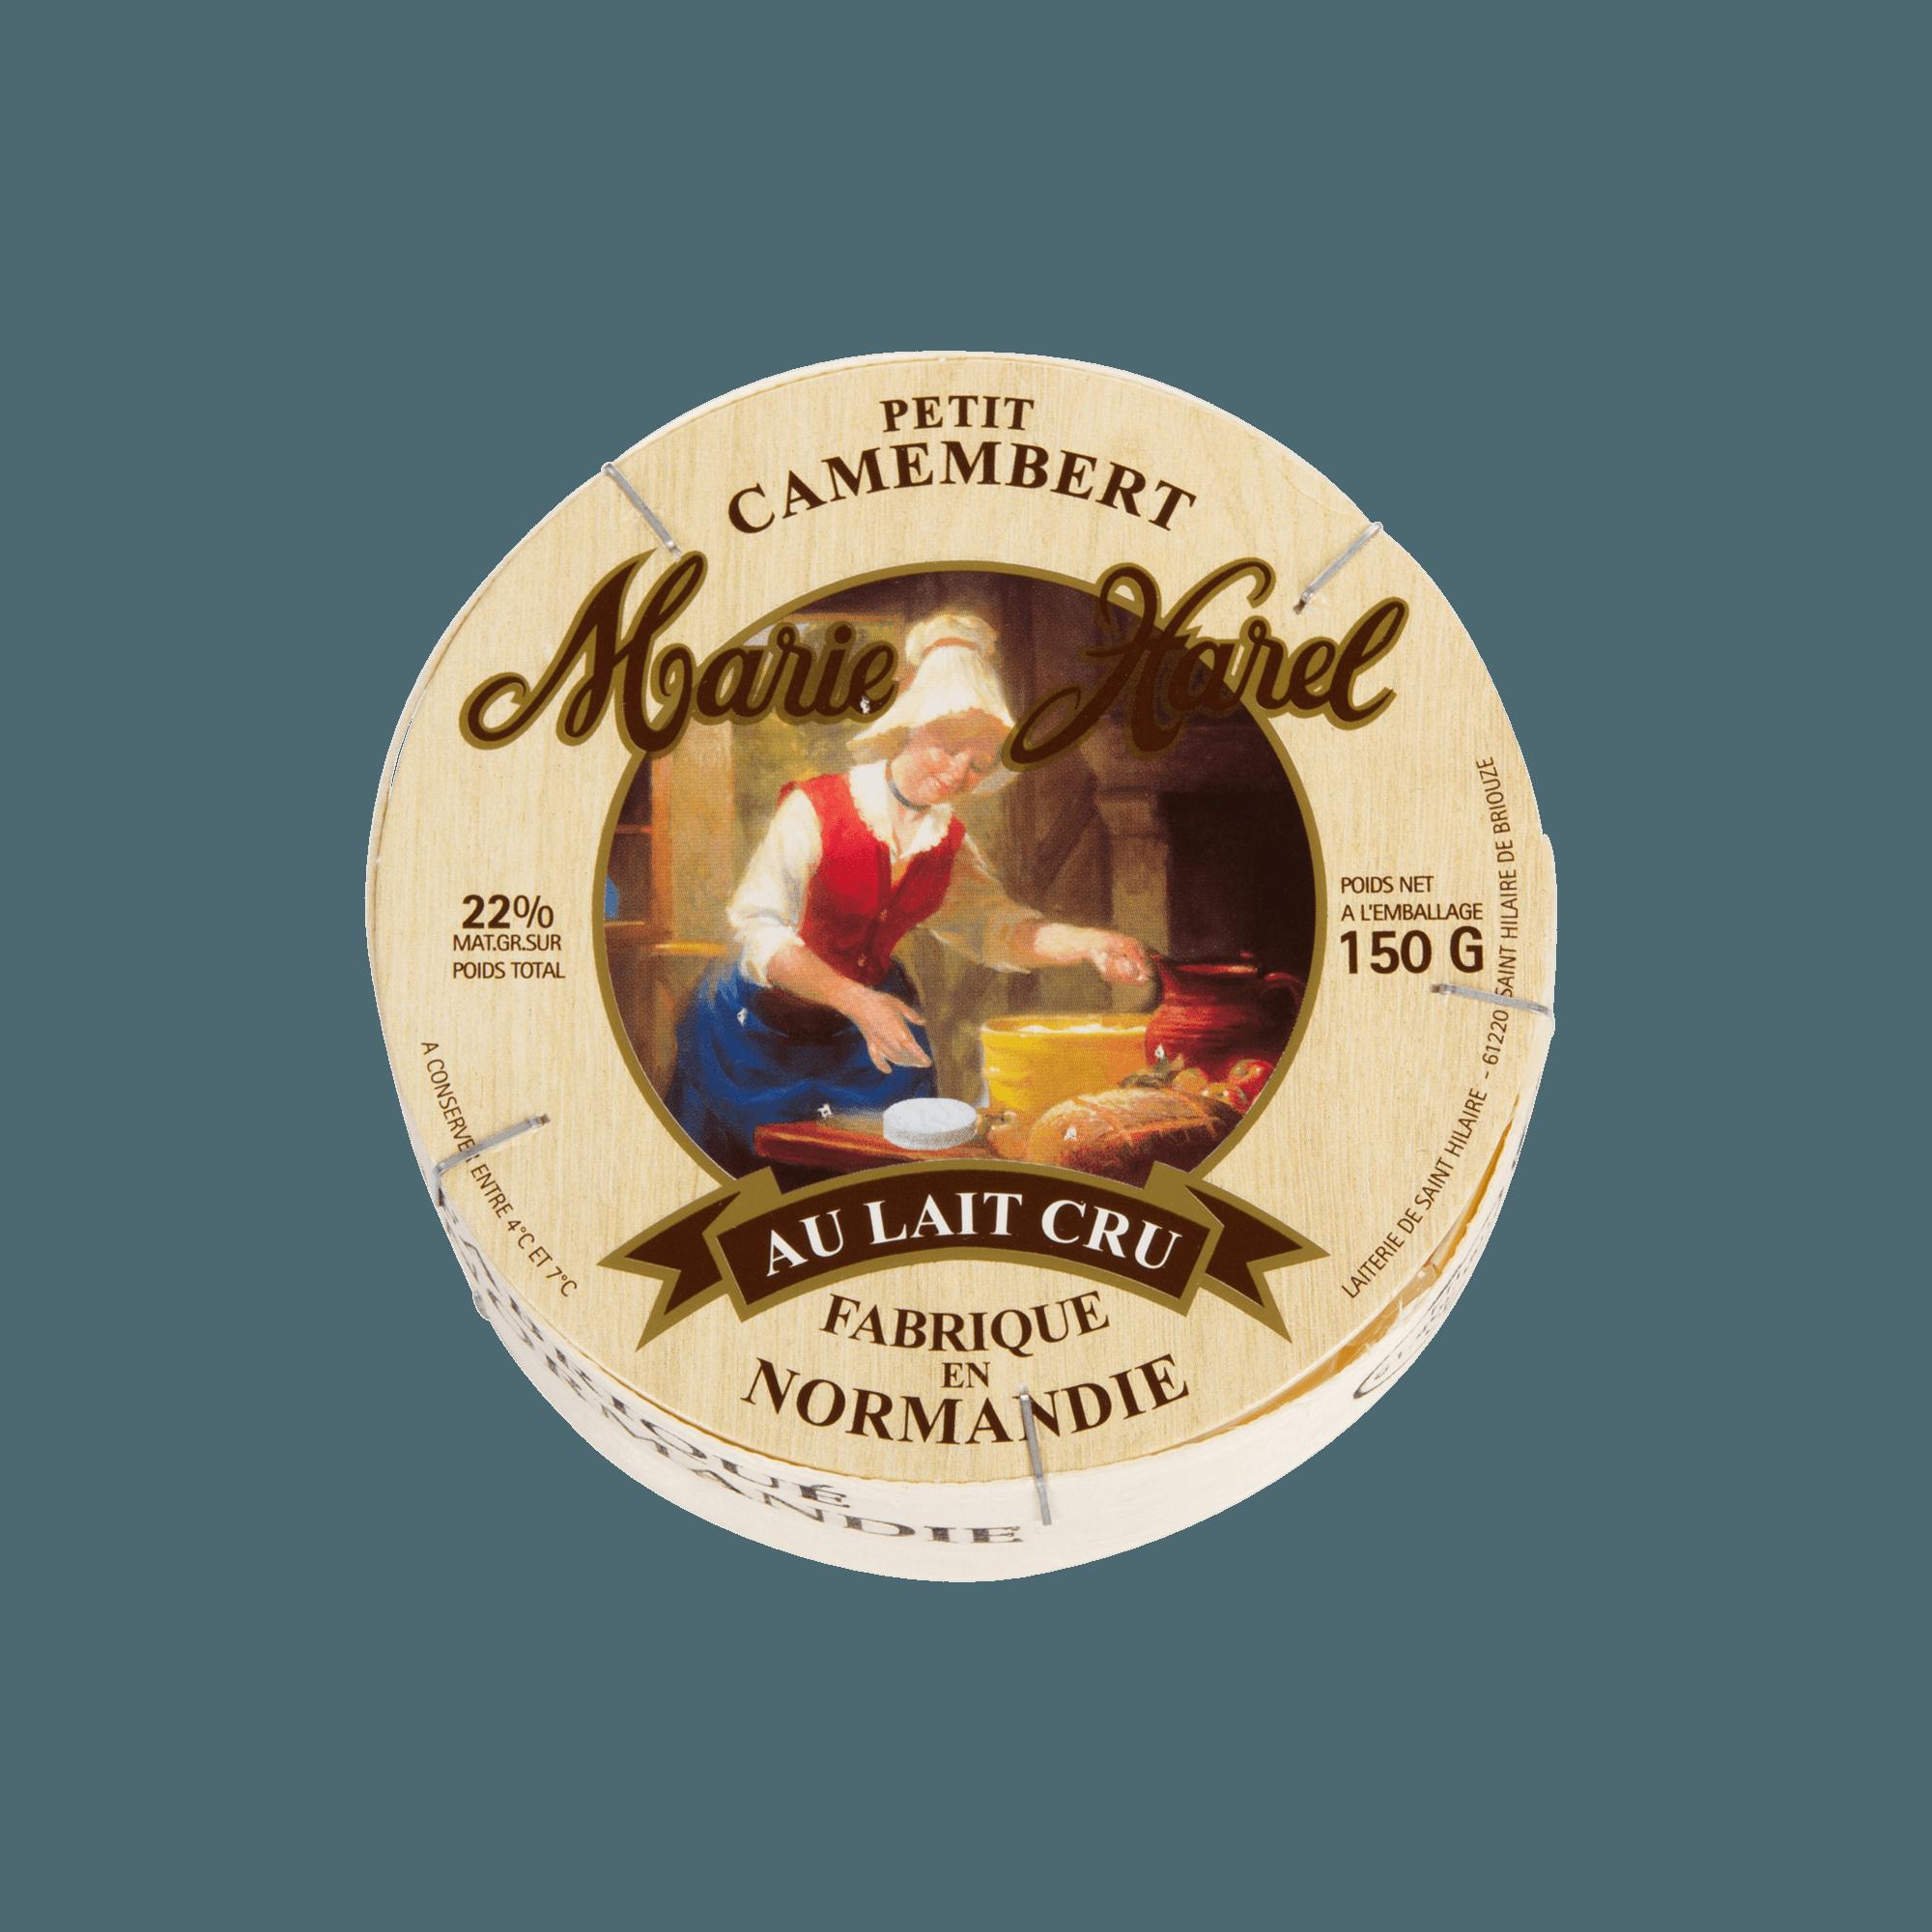 Marie-Harel – Petit Camembert au lait cru